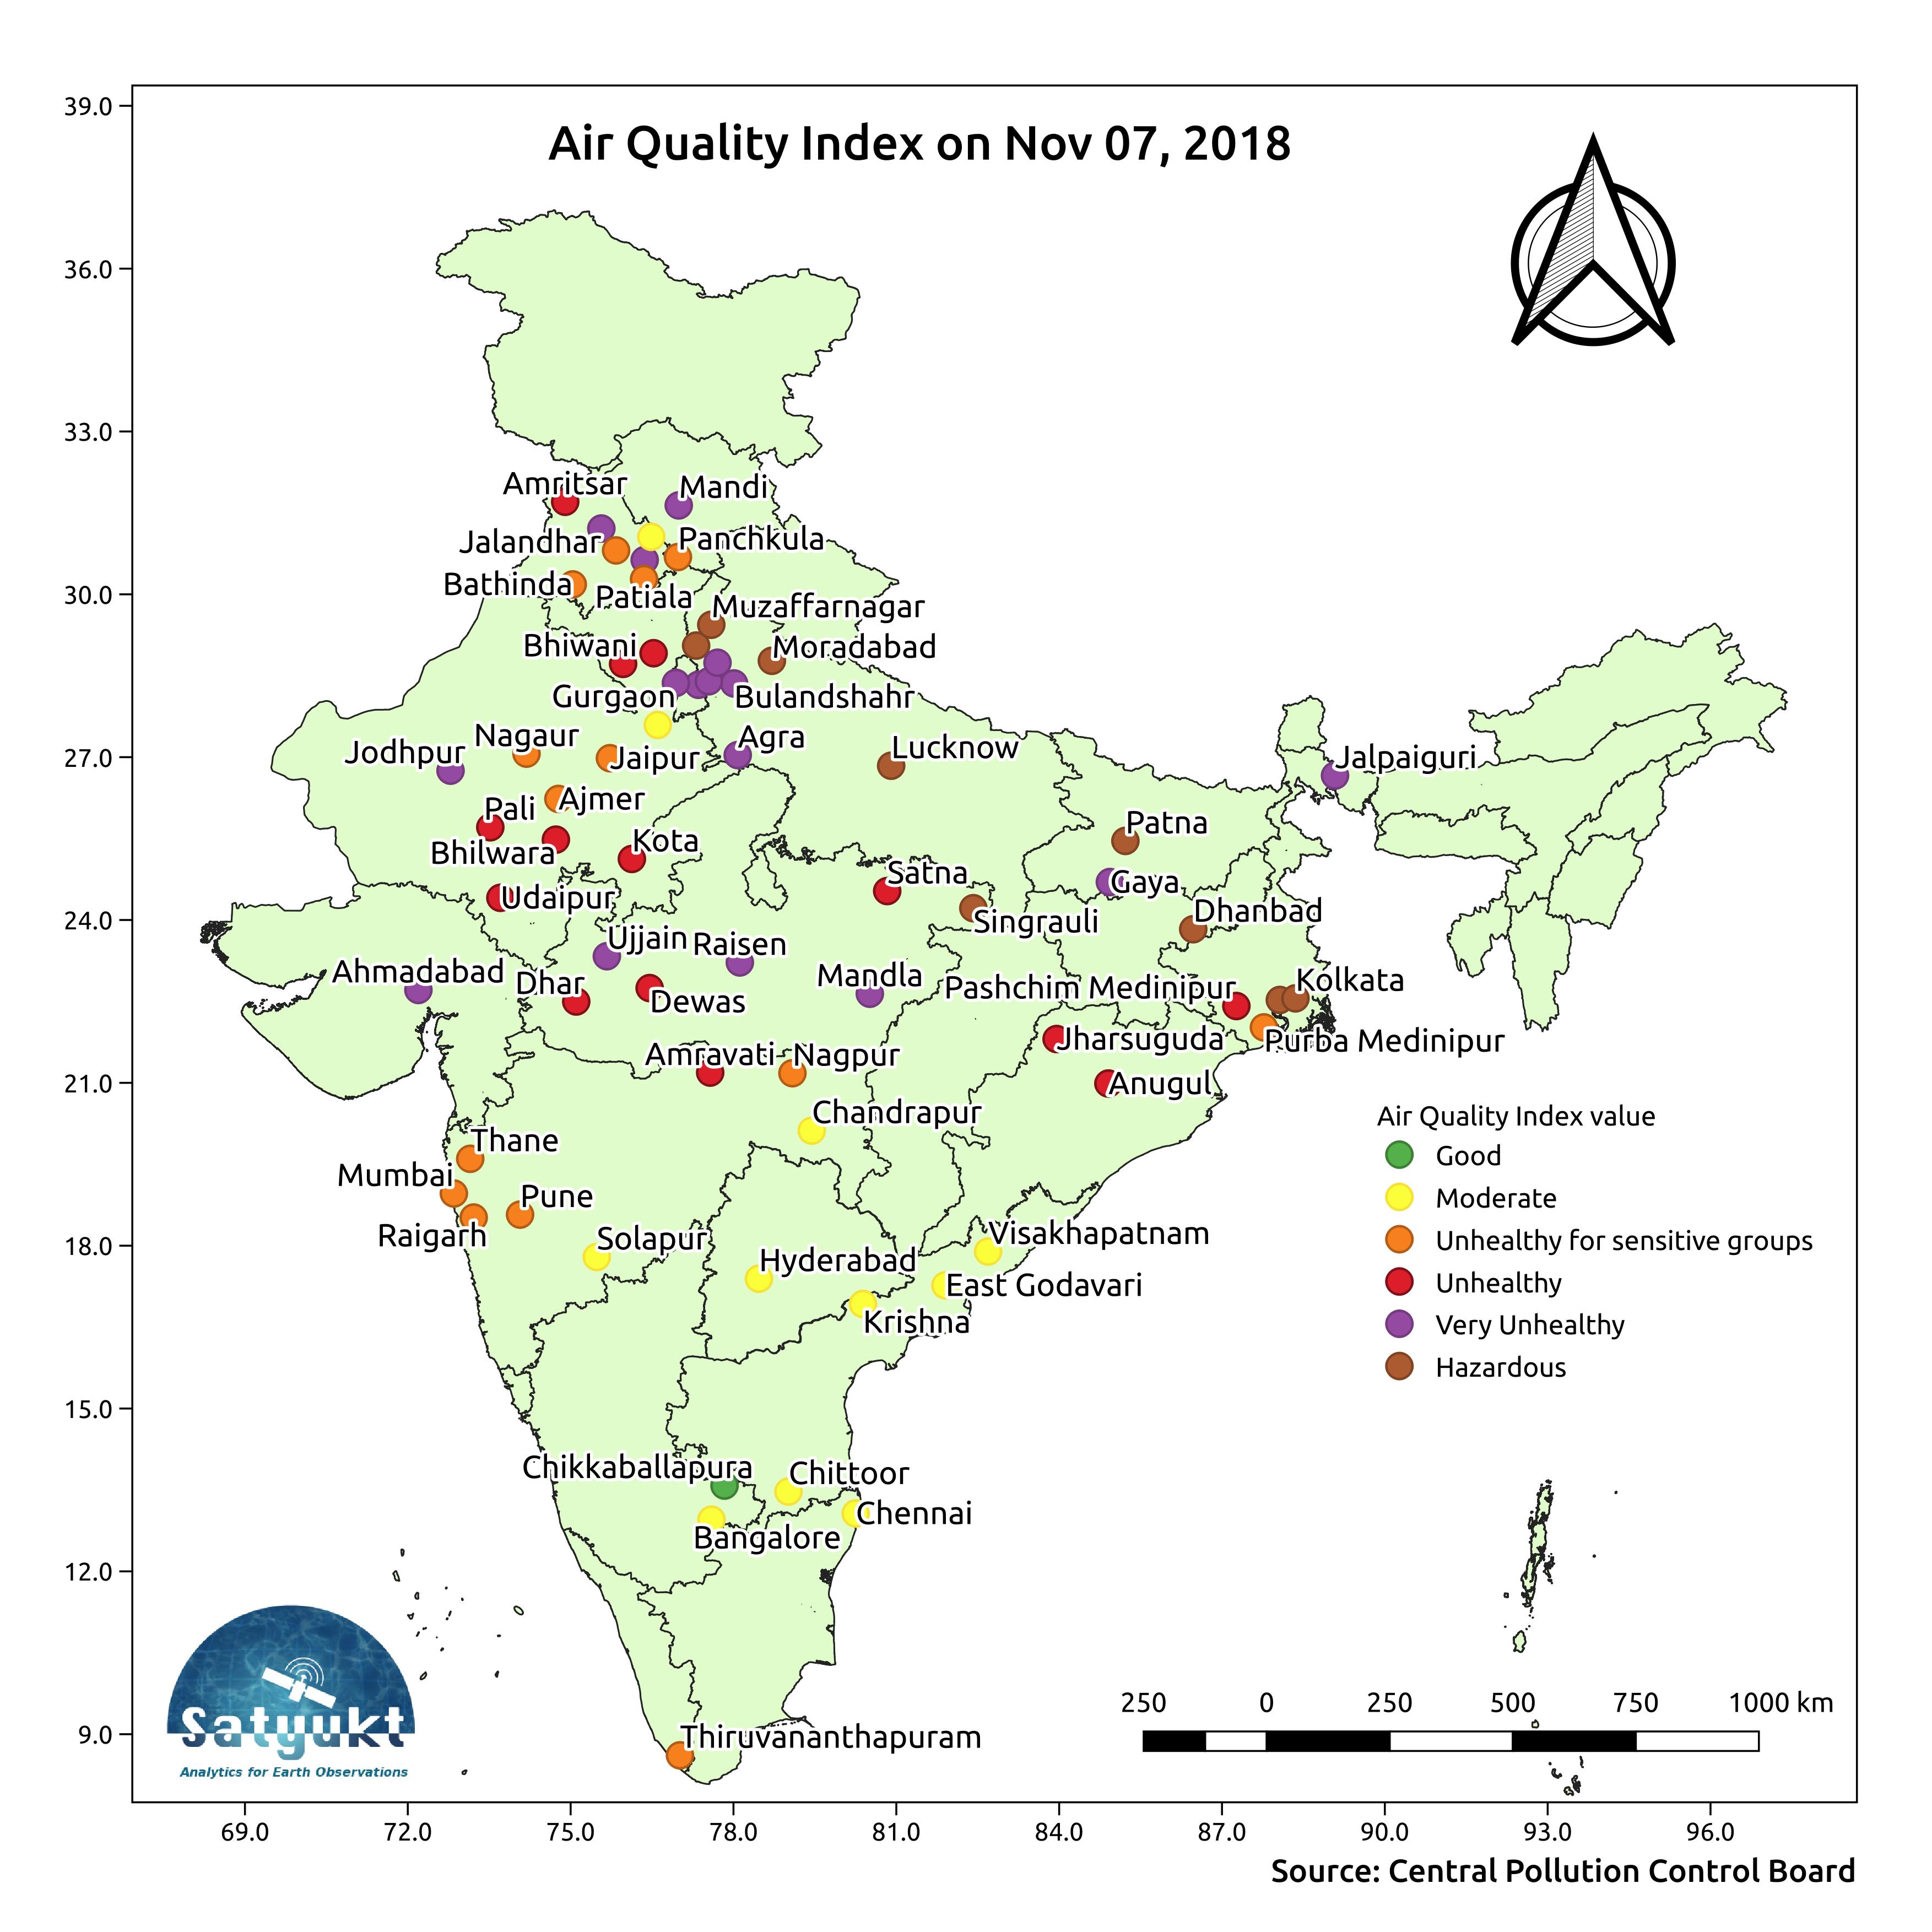 Air Quality Index (AQI) after Diwali is